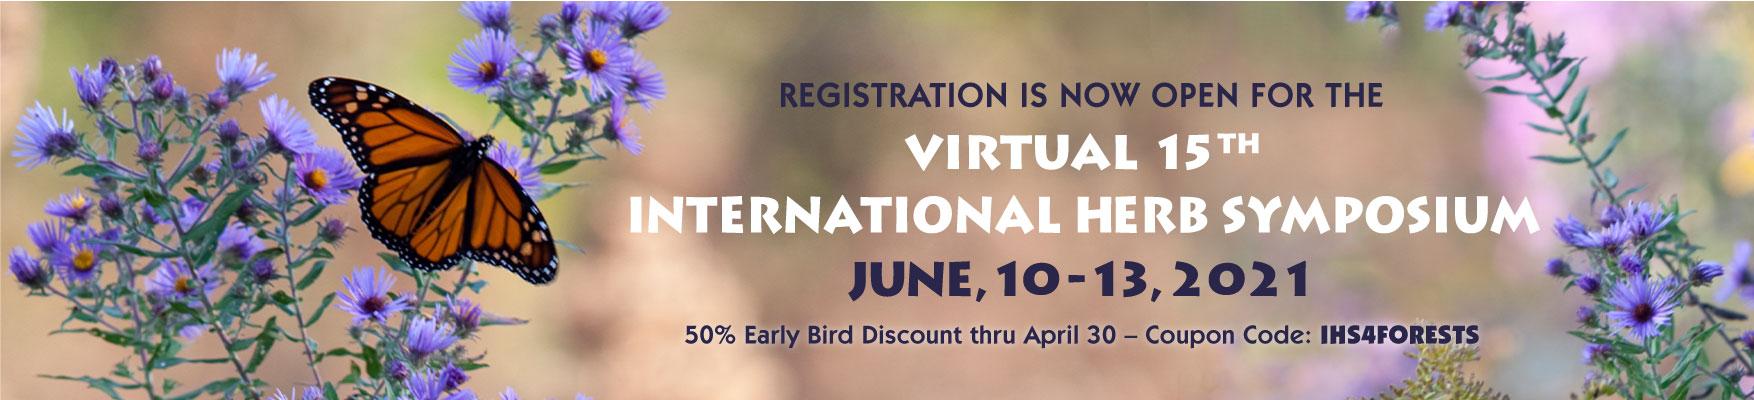 15th International Herb Symposium